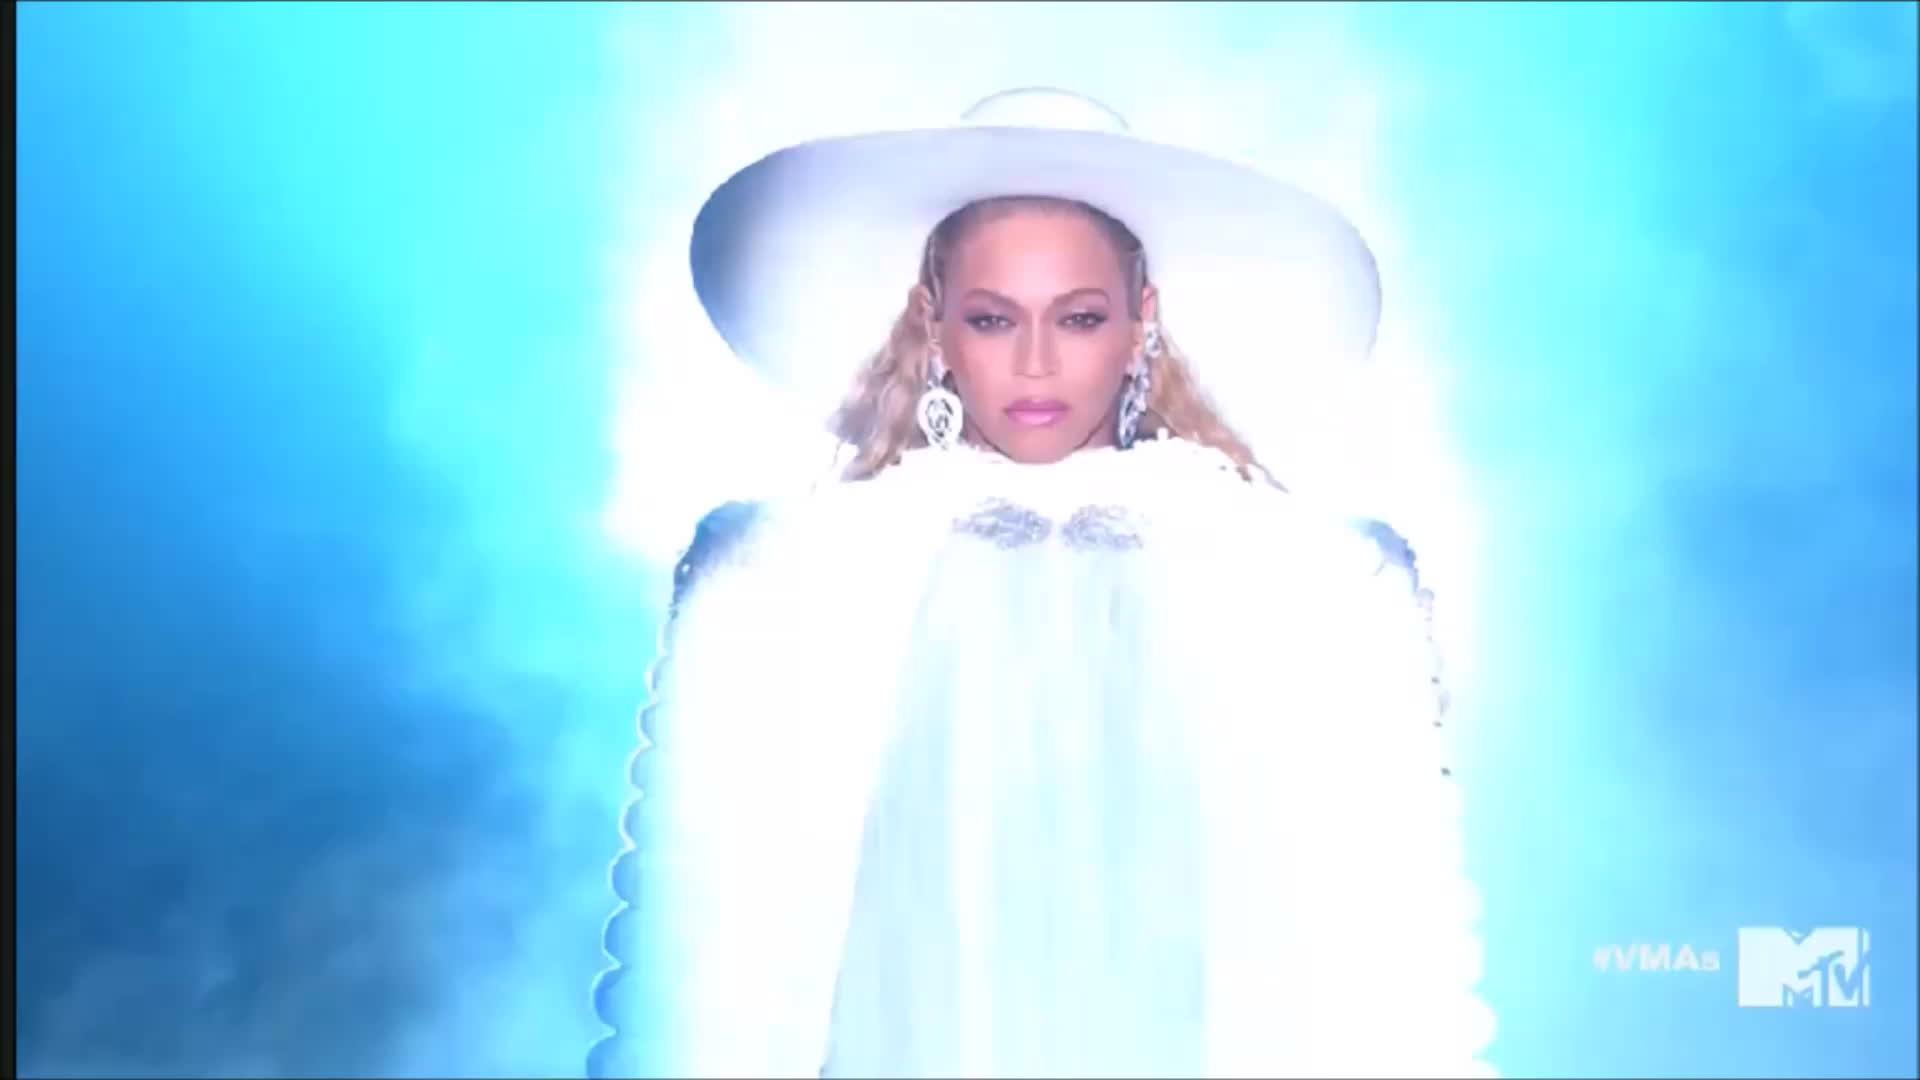 beyonce, vmas, vmas2016, Beyonce aint' playing. VMAS 2016 GIFs